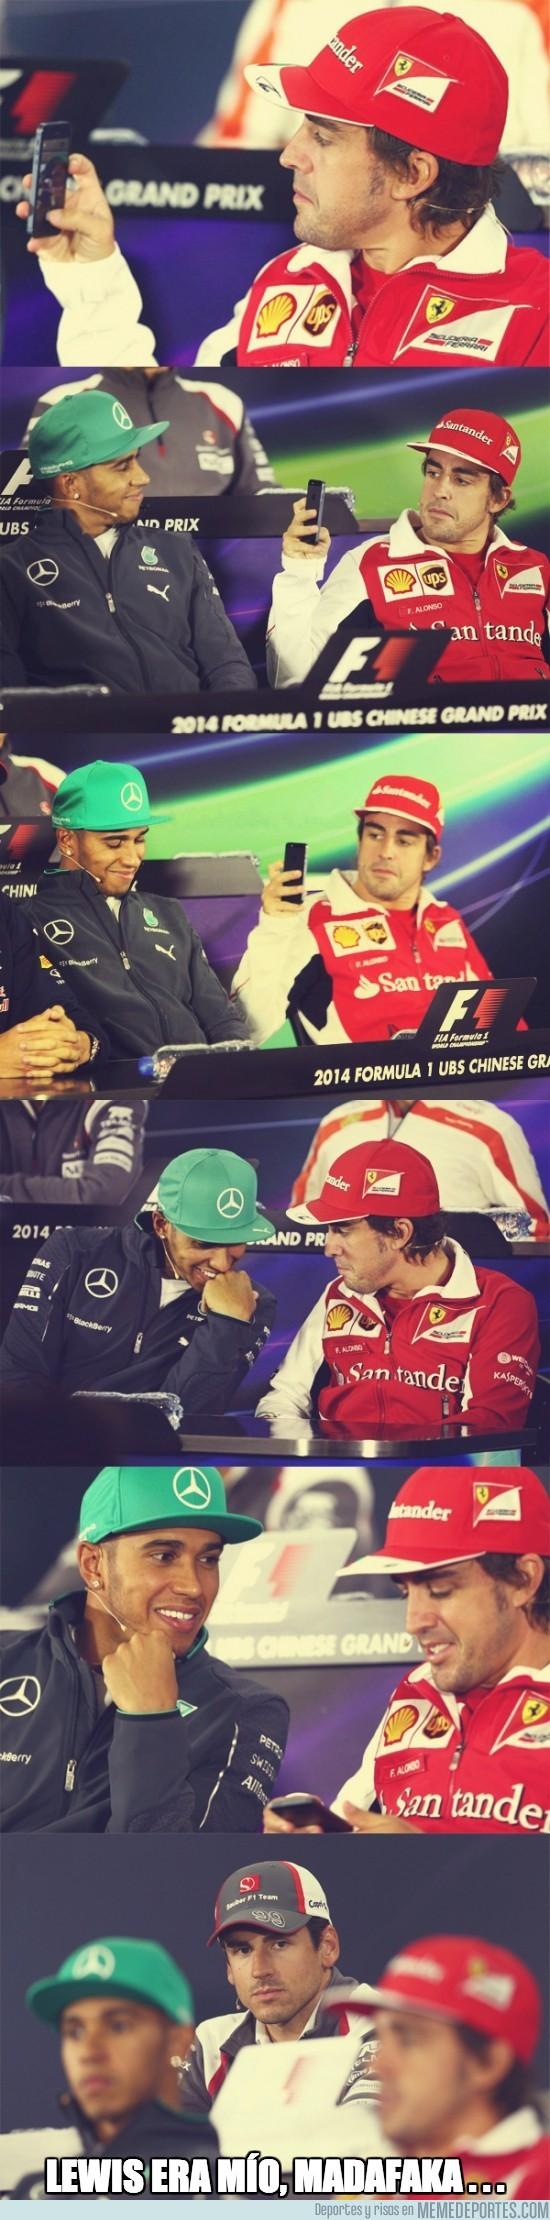 332573 - Alonso le quita Hamilton a Adrian Sutil